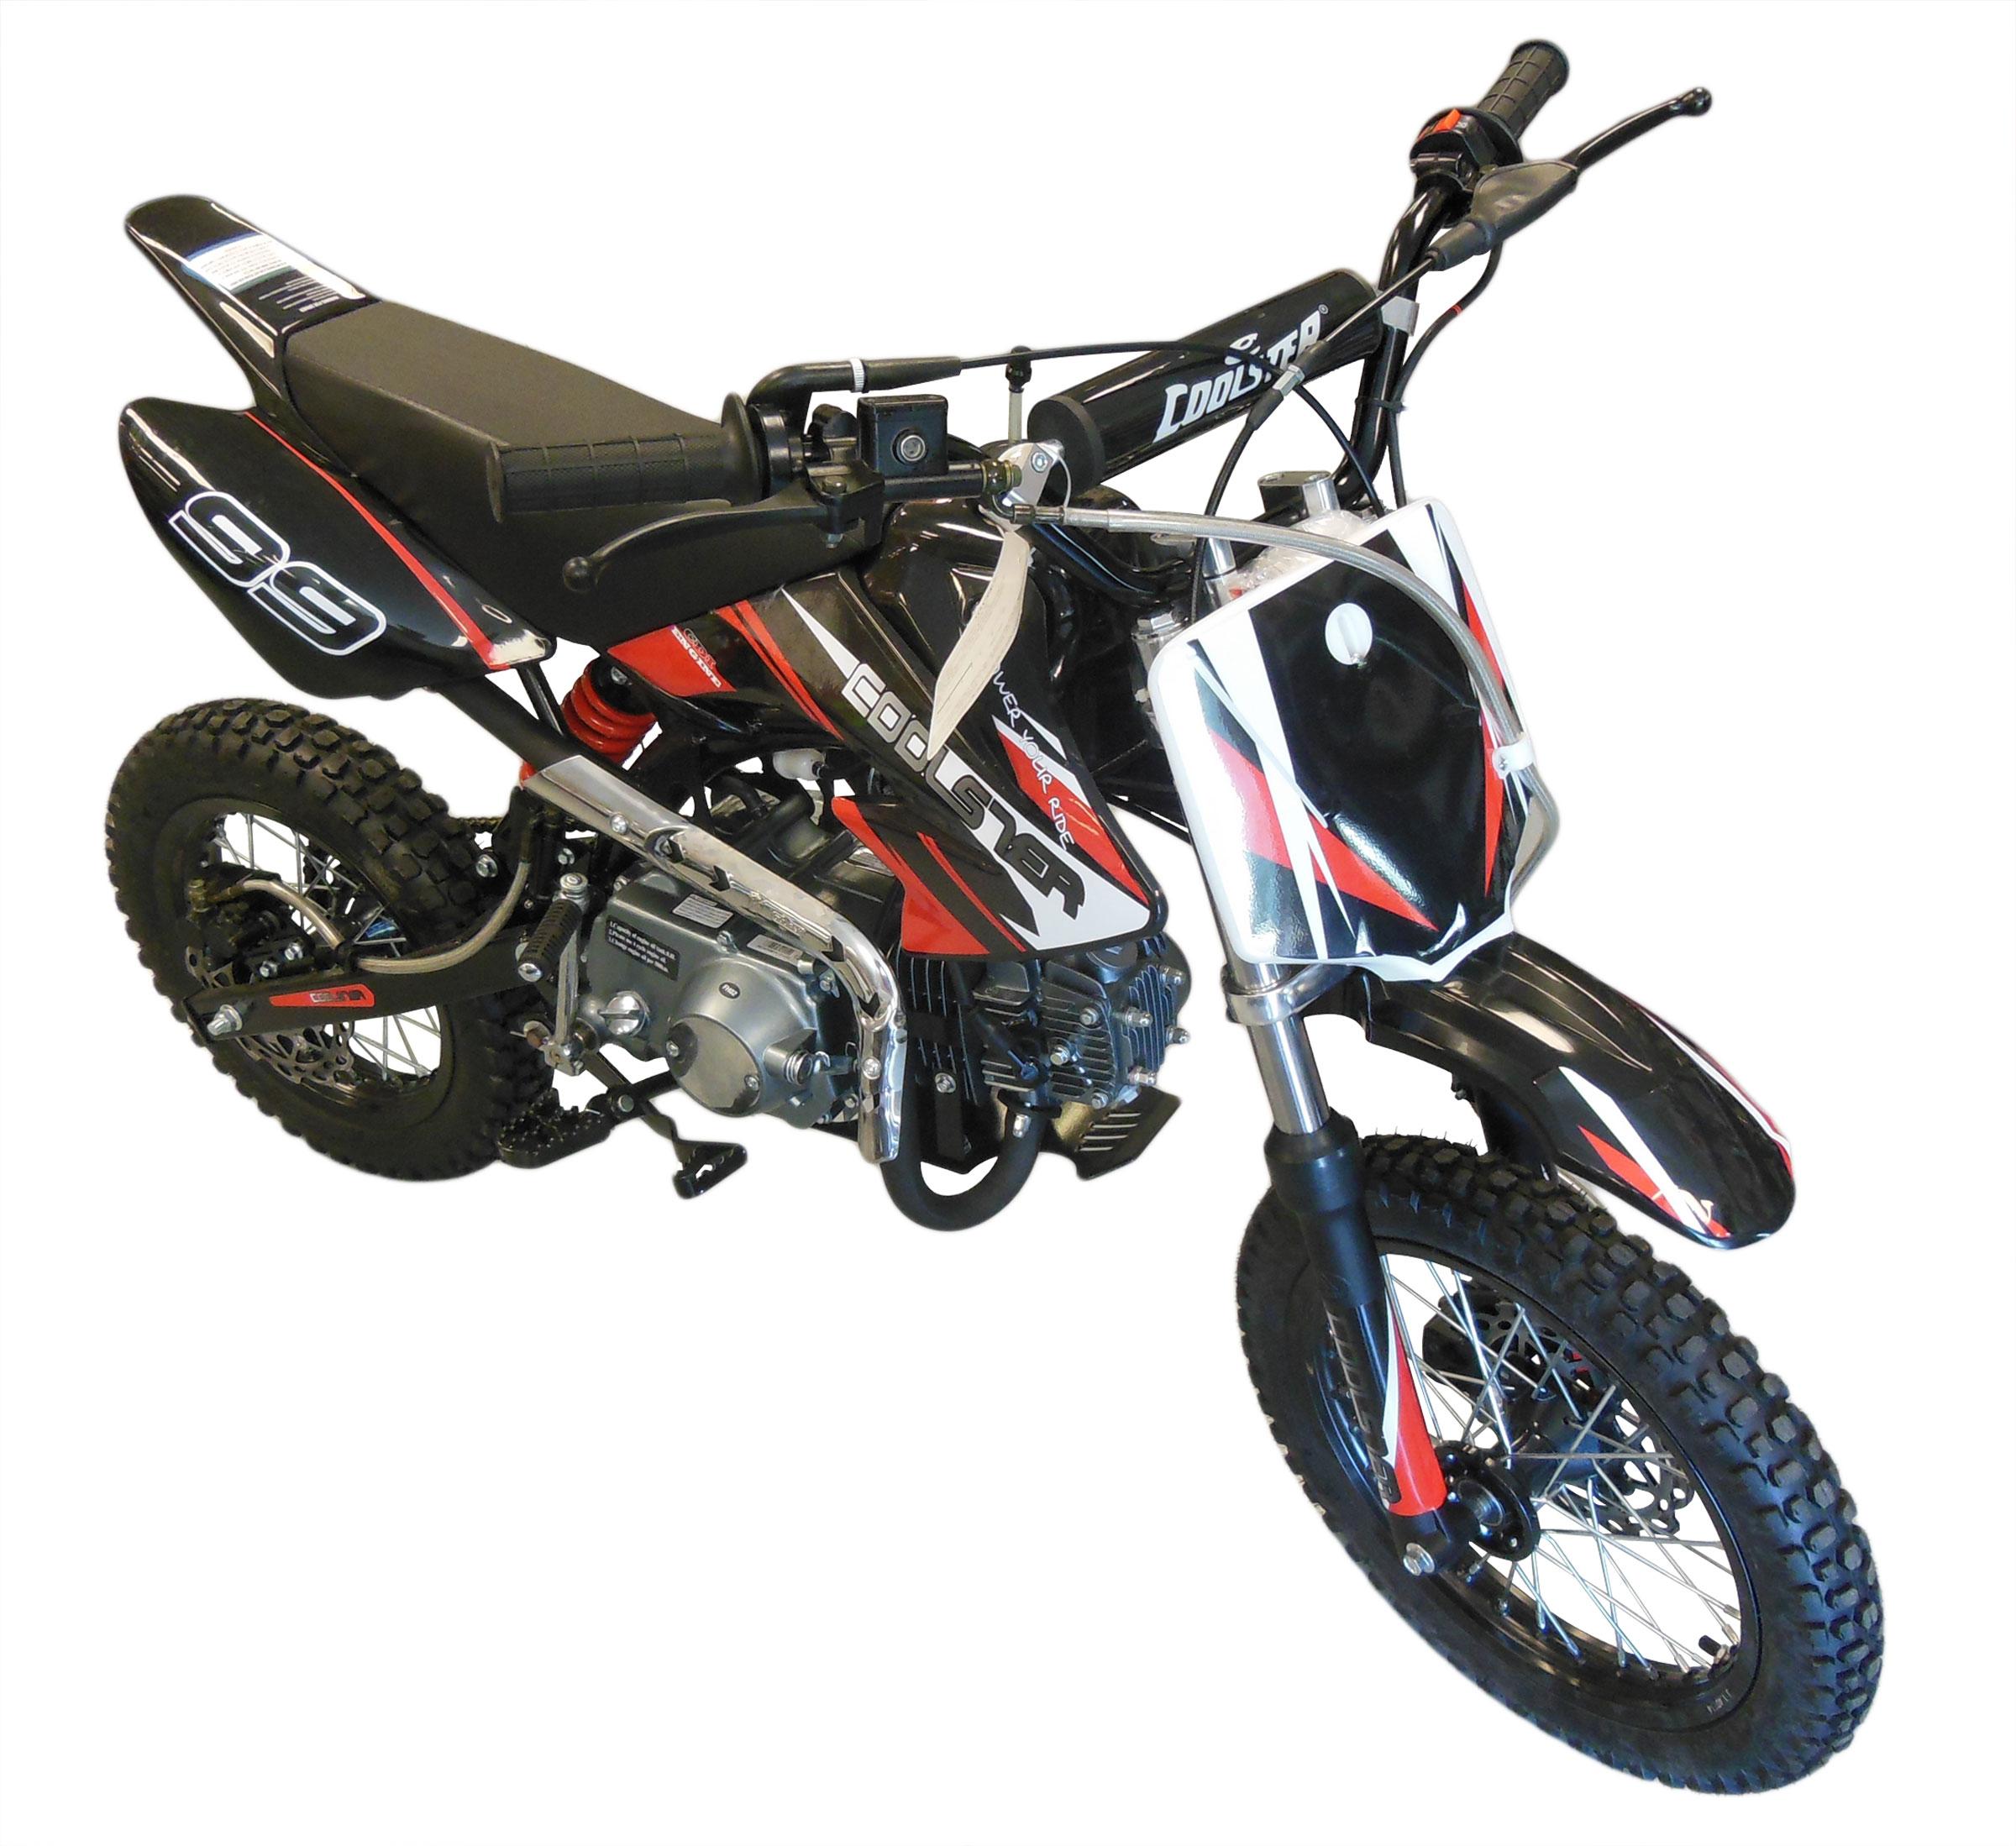 dfe7f61be1e Trailmaster 125cc Coolster Dirt Bike | COOLSTER-QG-214 | QG-214 ...